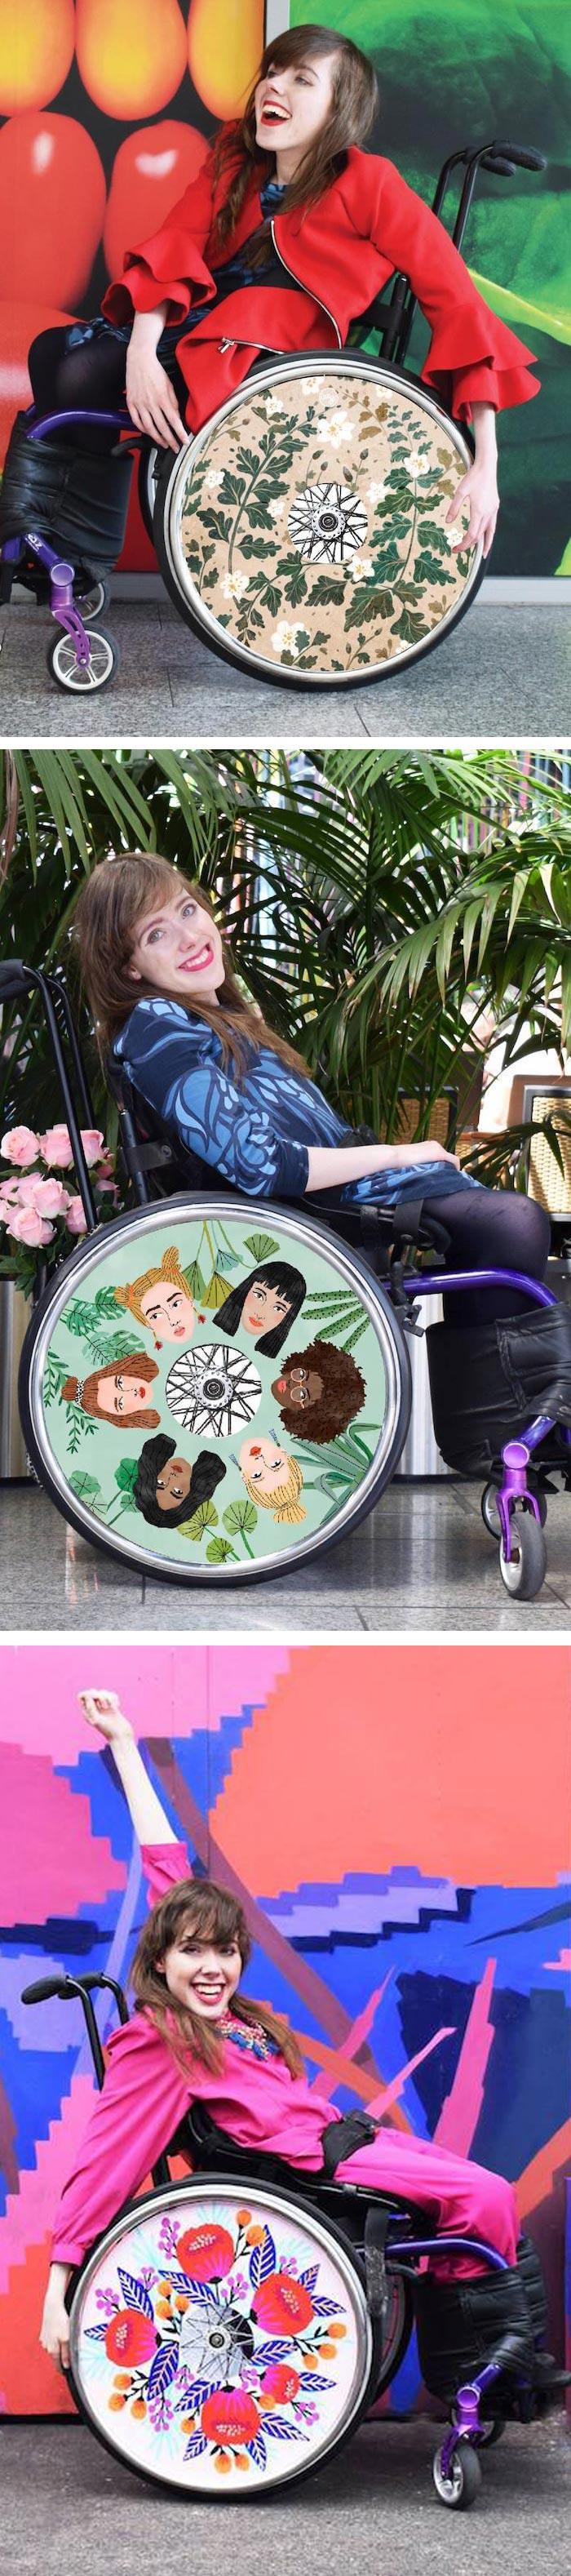 Izzy Wheels stylish wheel covers